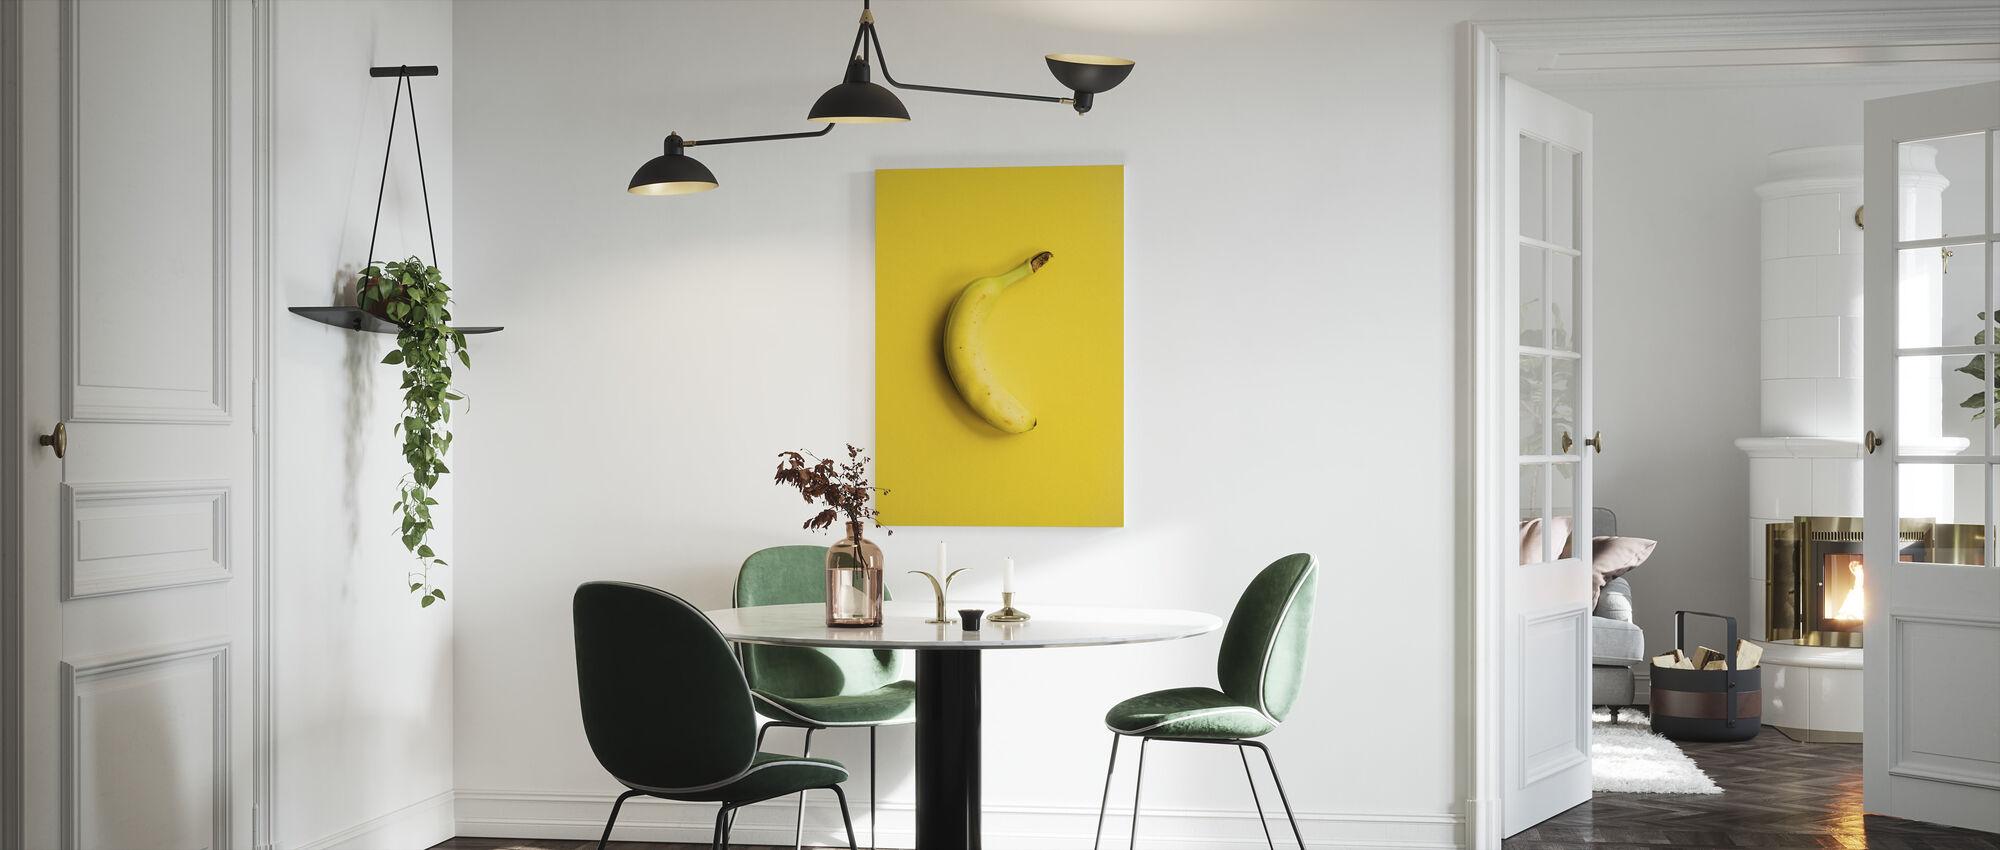 Yellow Banana - Canvas print - Kitchen